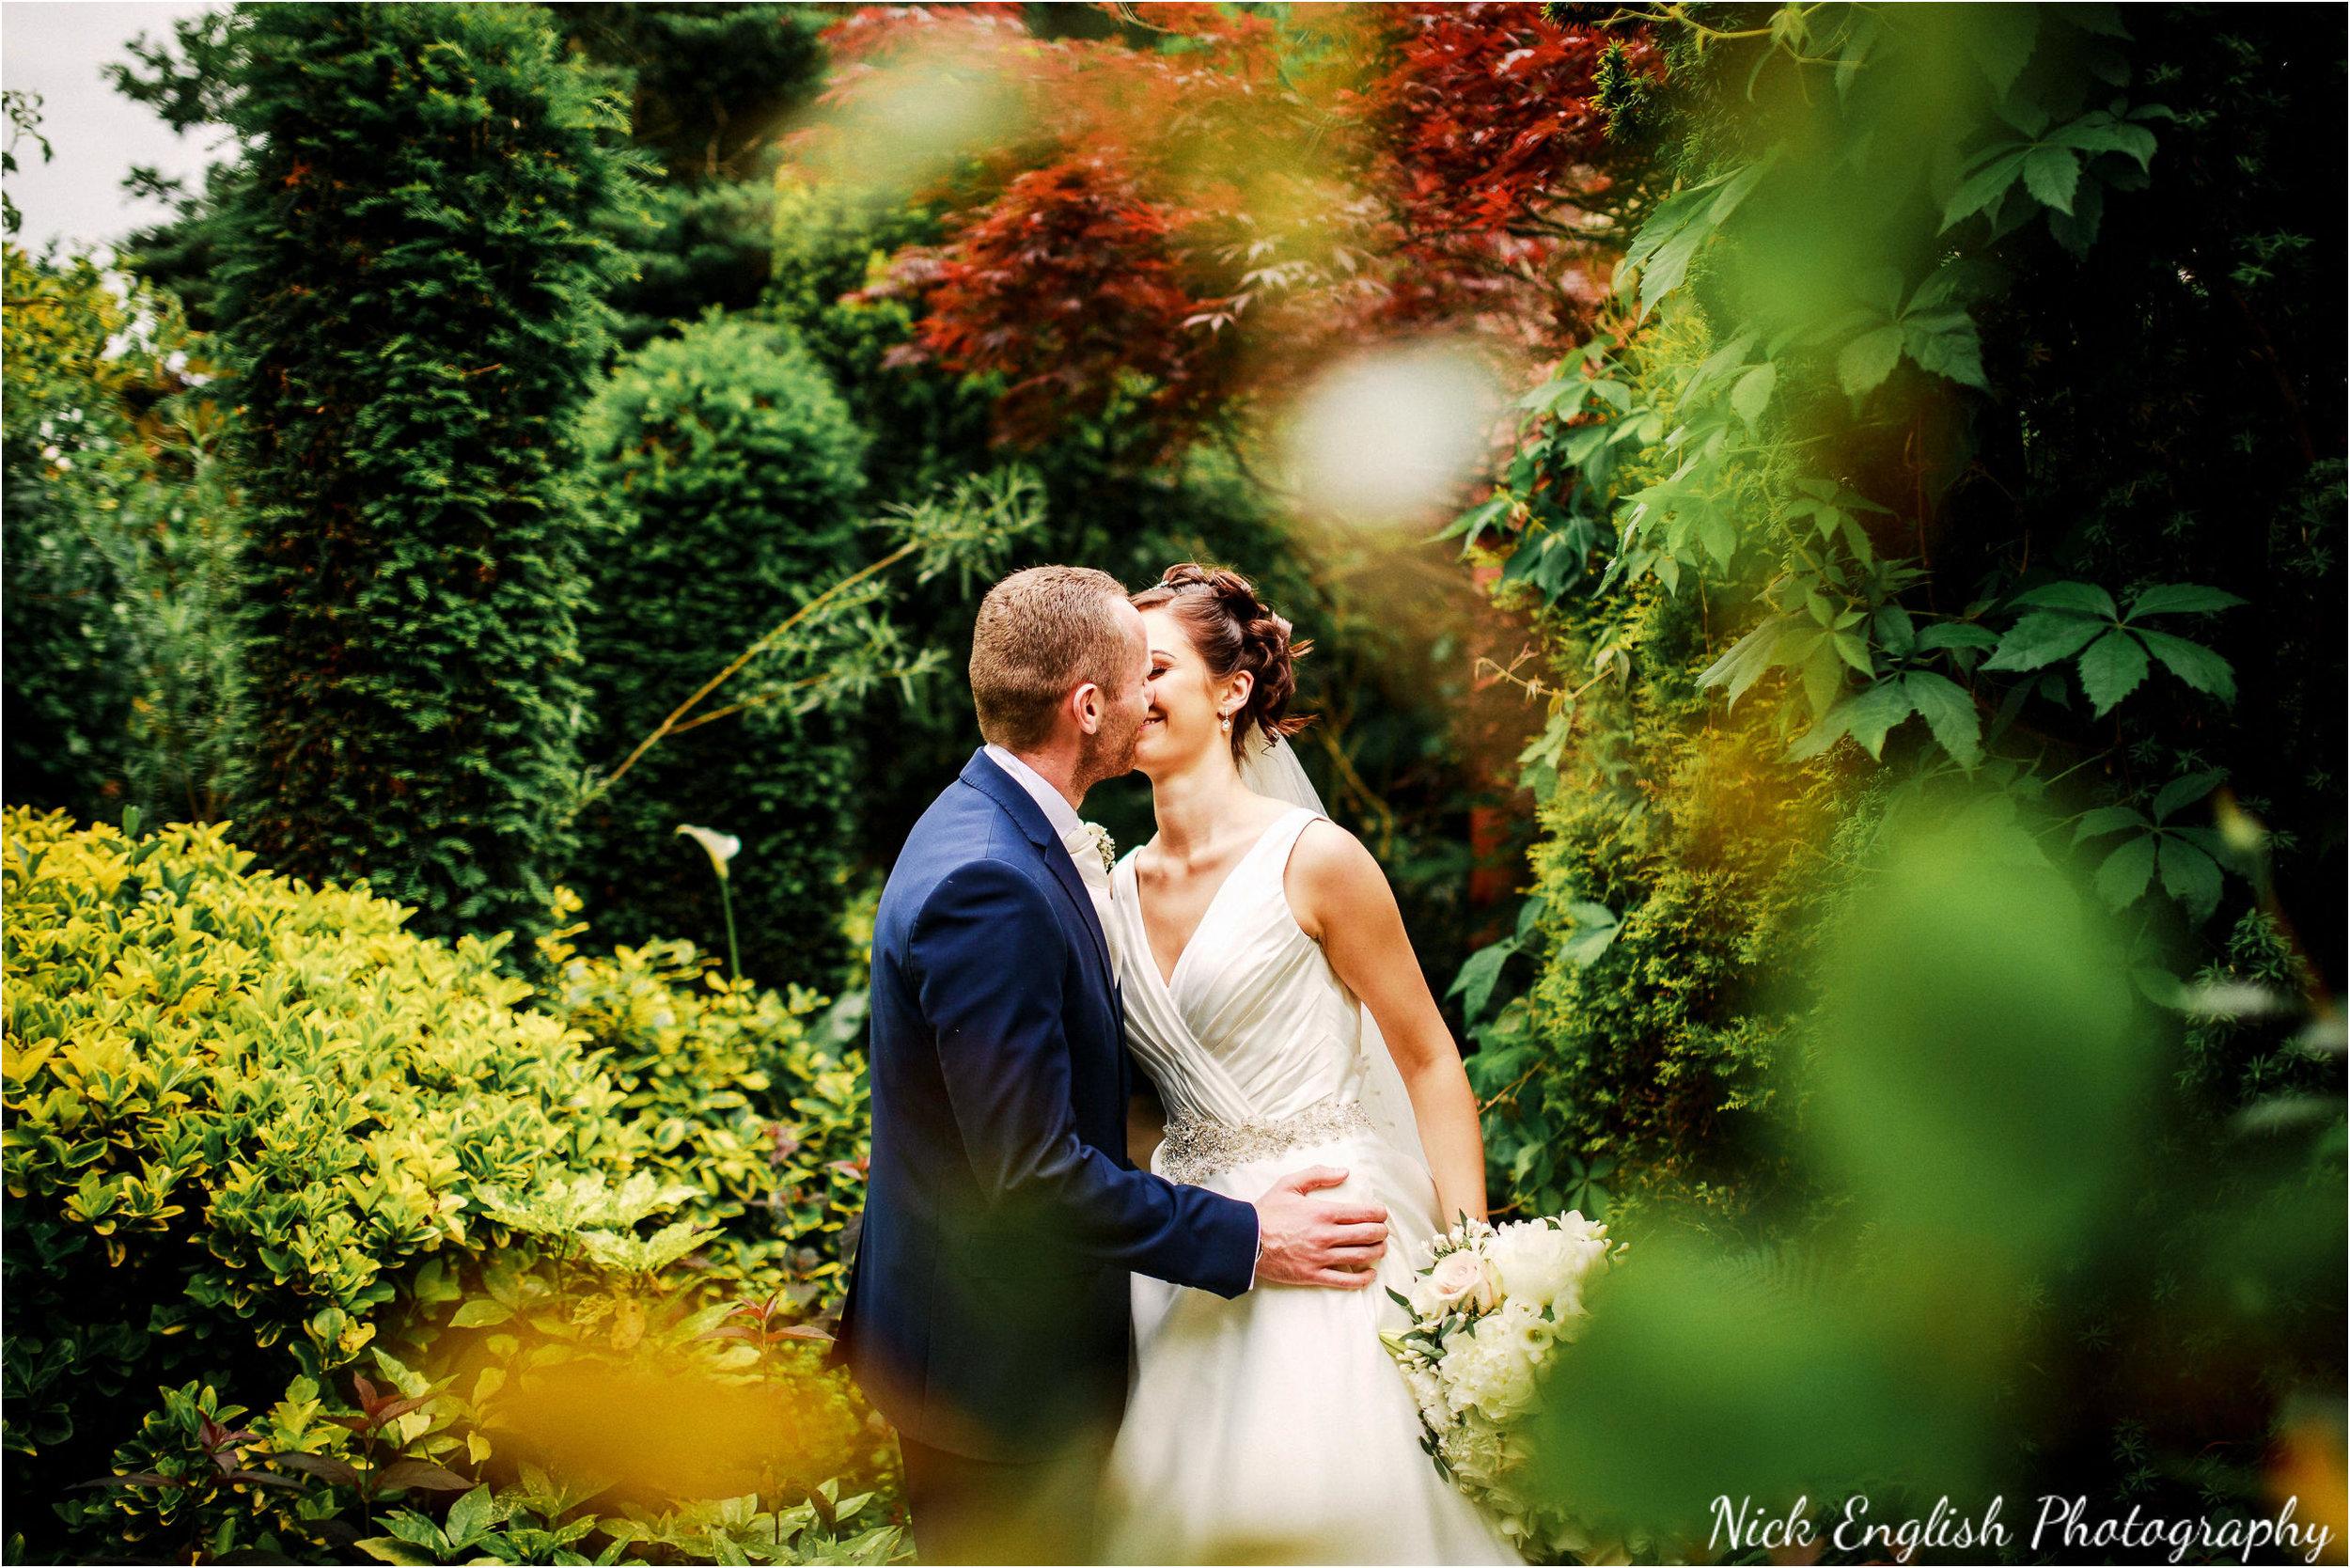 Emily David Wedding Photographs at Barton Grange Preston by Nick English Photography 146jpg.jpeg